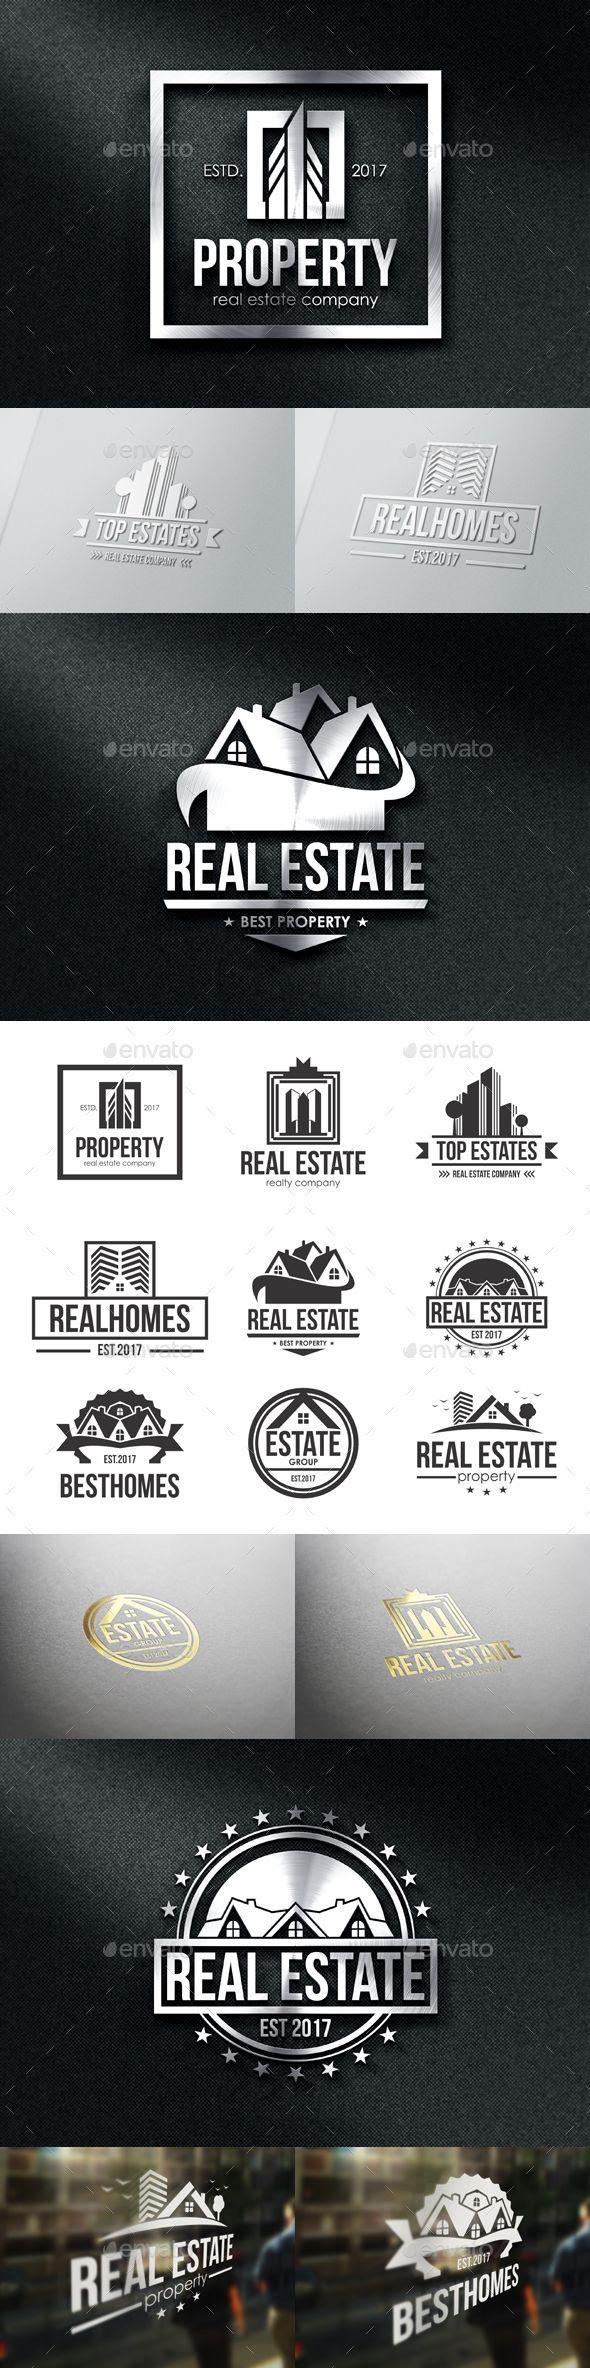 Property Real Estate Badges & Logos Real estate logo